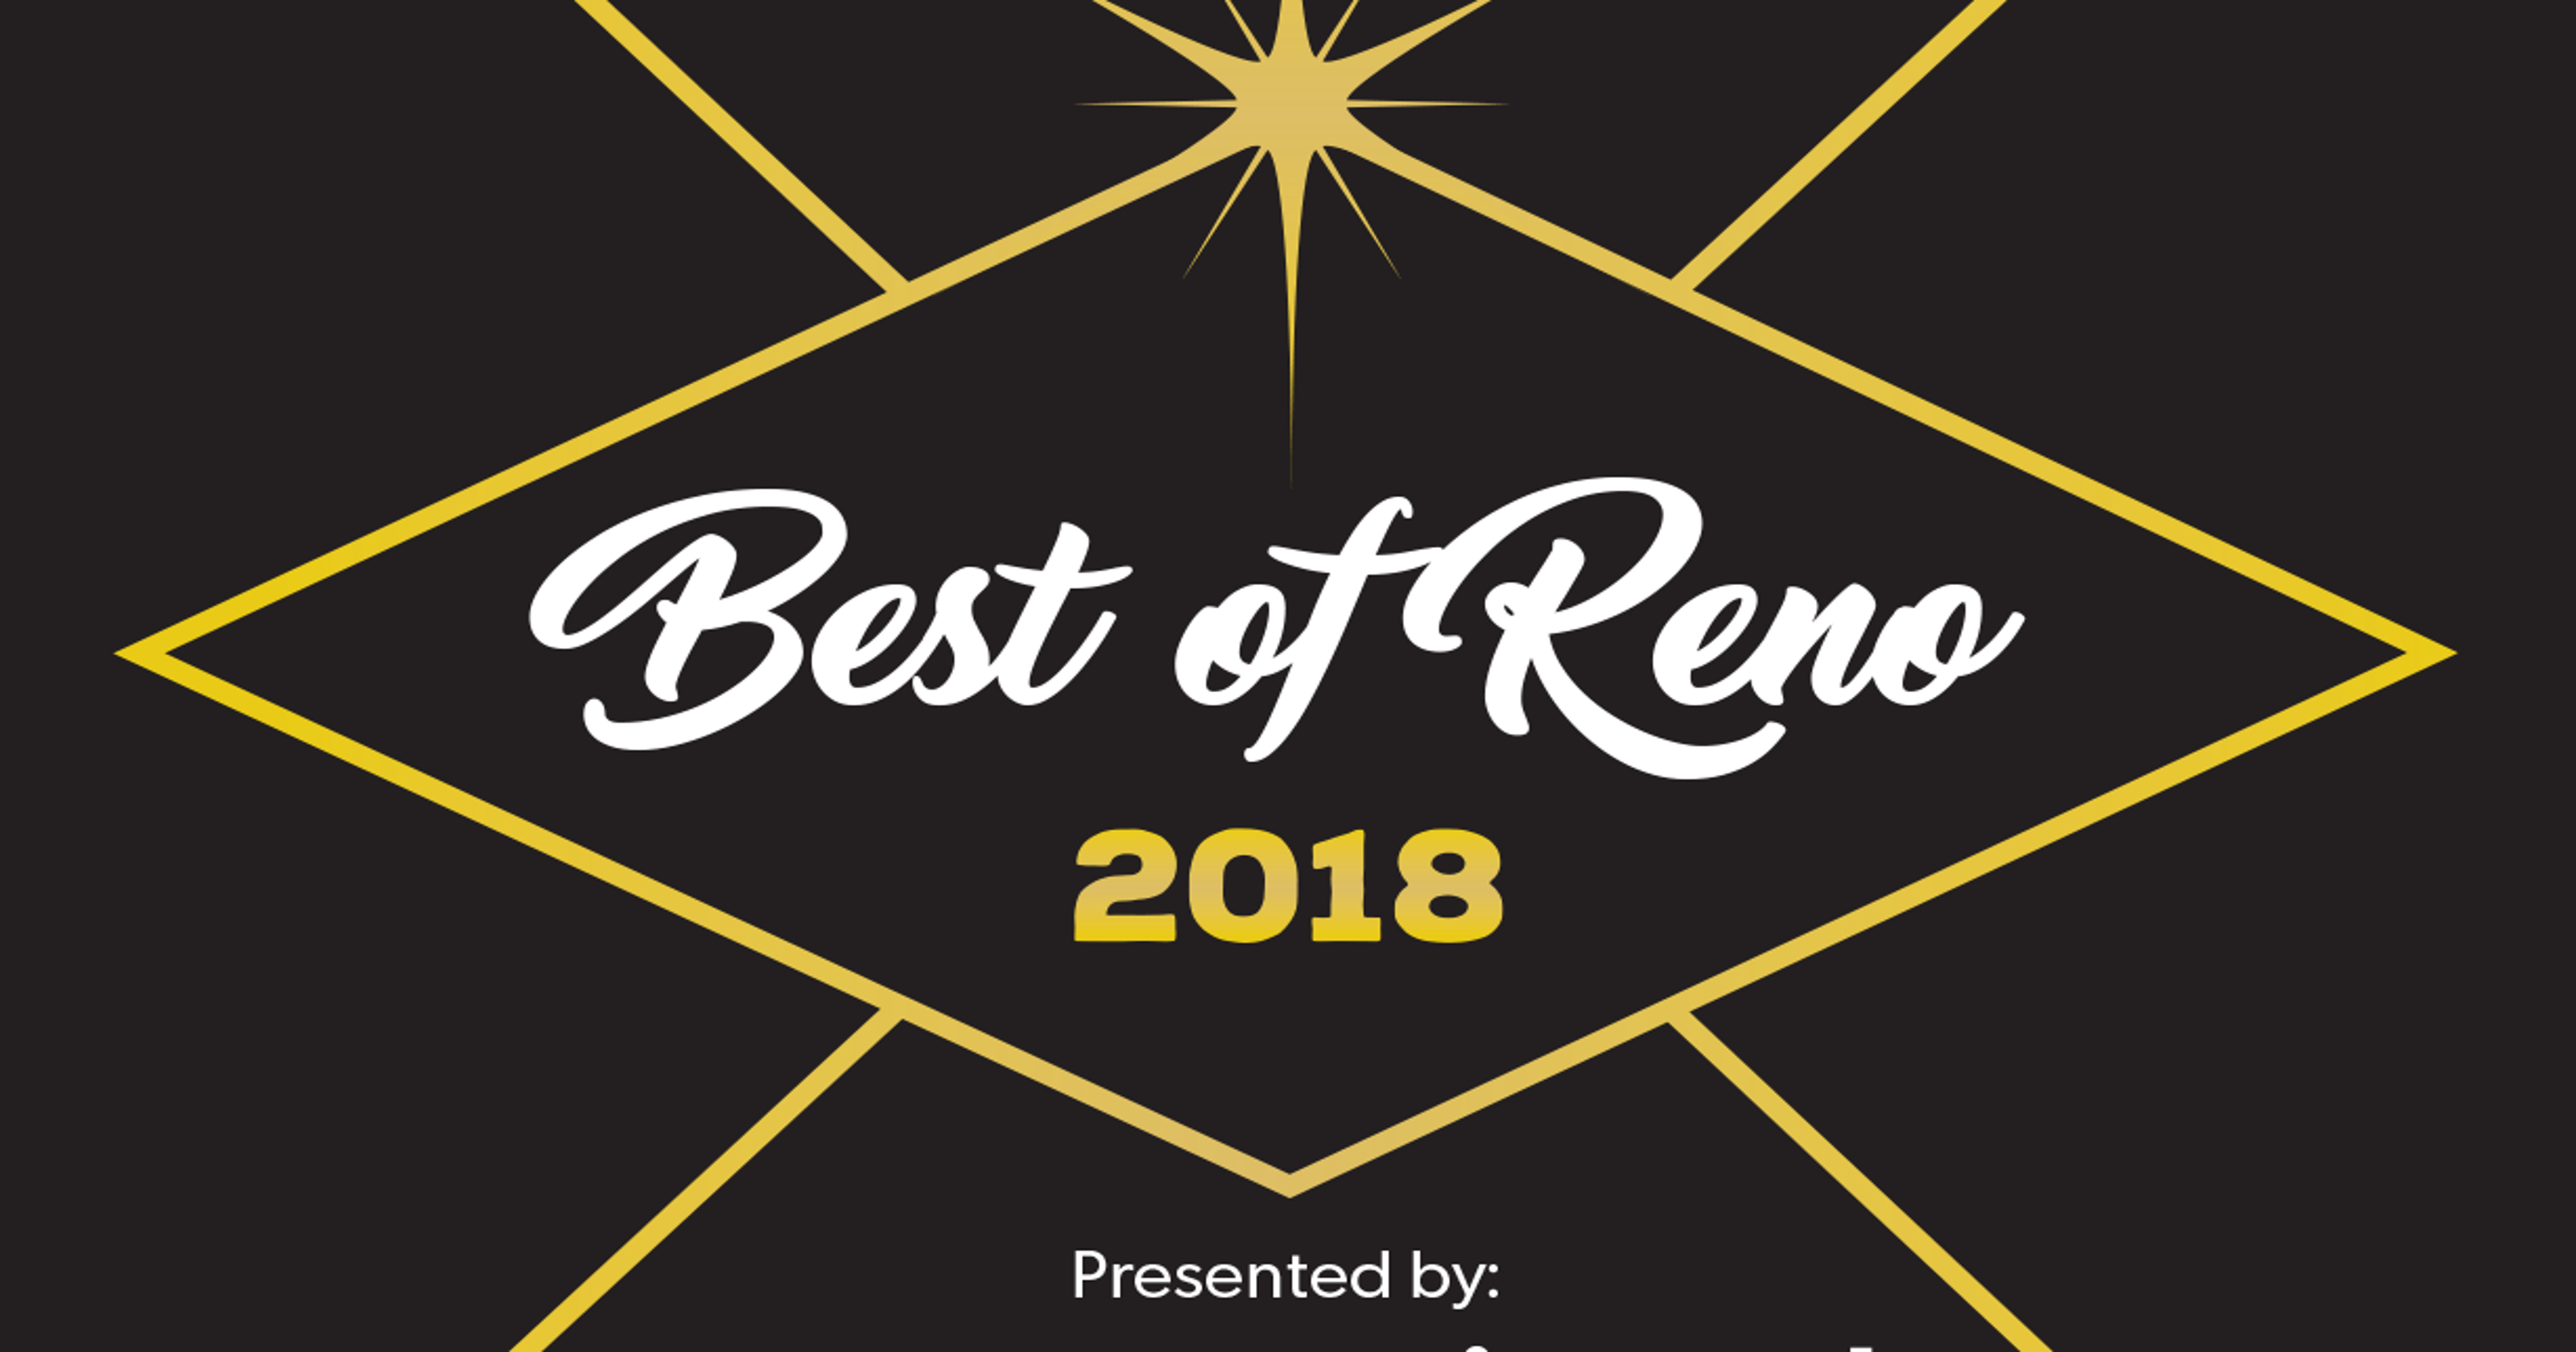 RGJ Best of Reno 2018 results: Restaurants, dispensaries and more